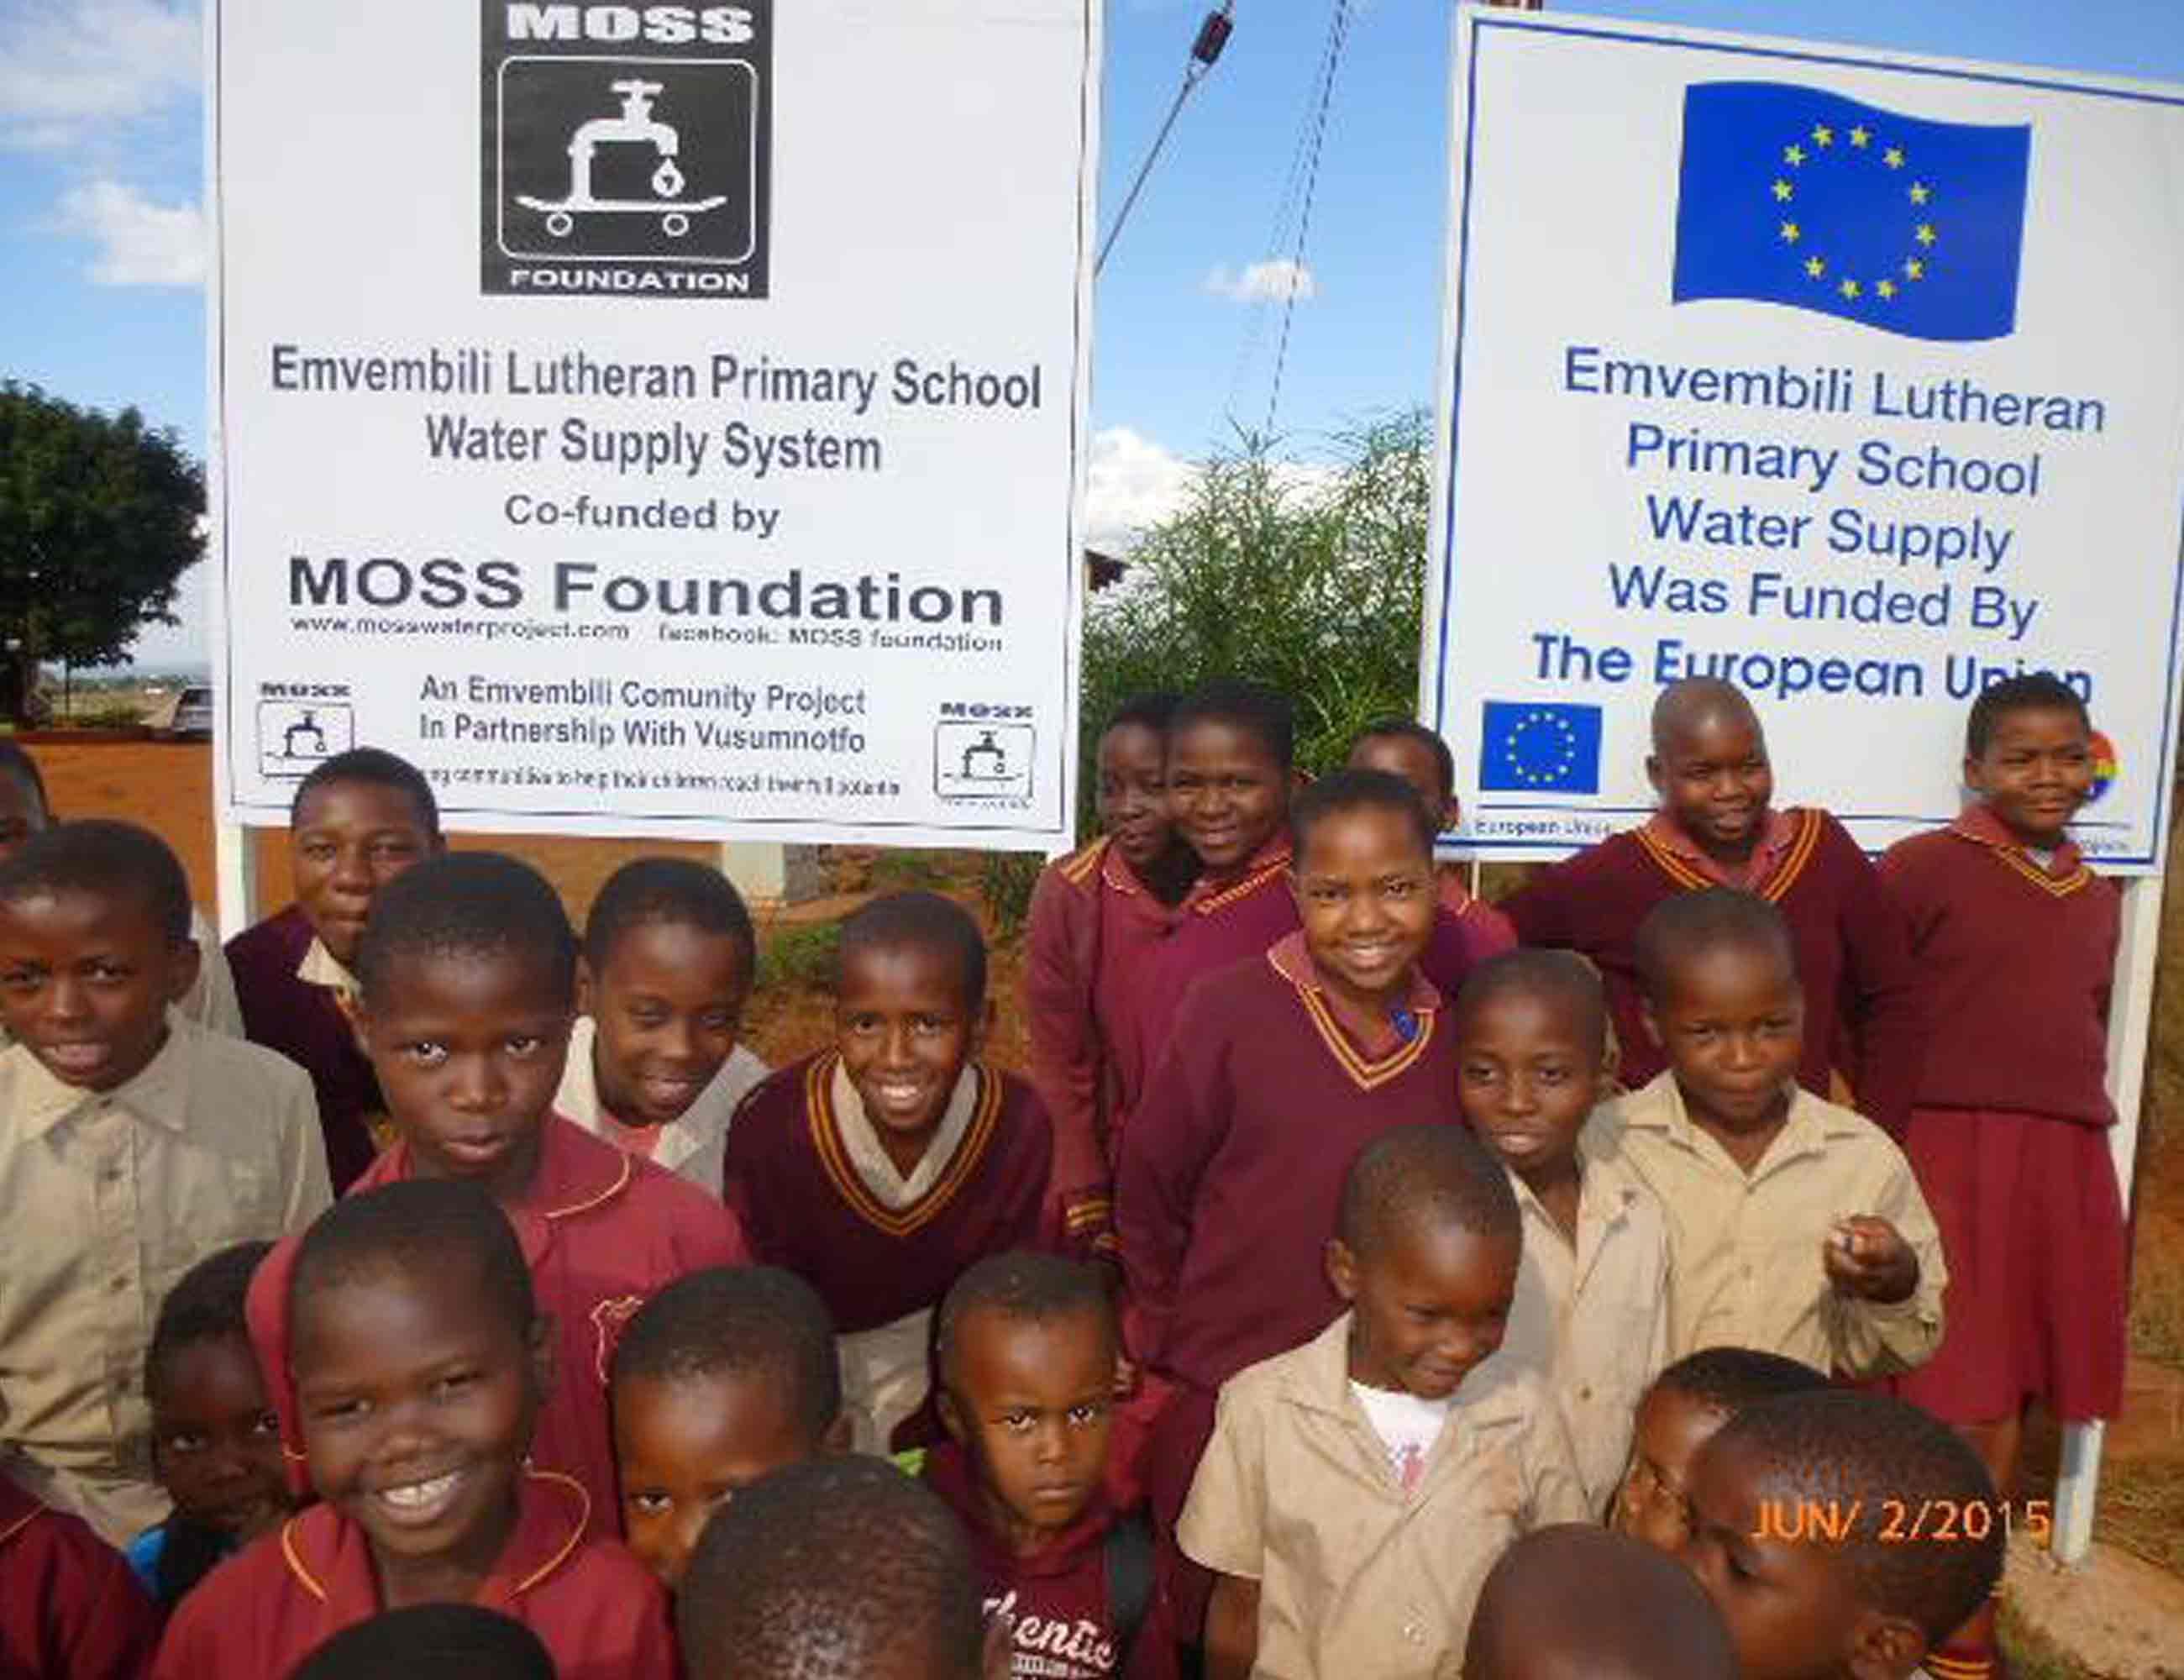 moss-foundation-emvembili-lutheran-primary